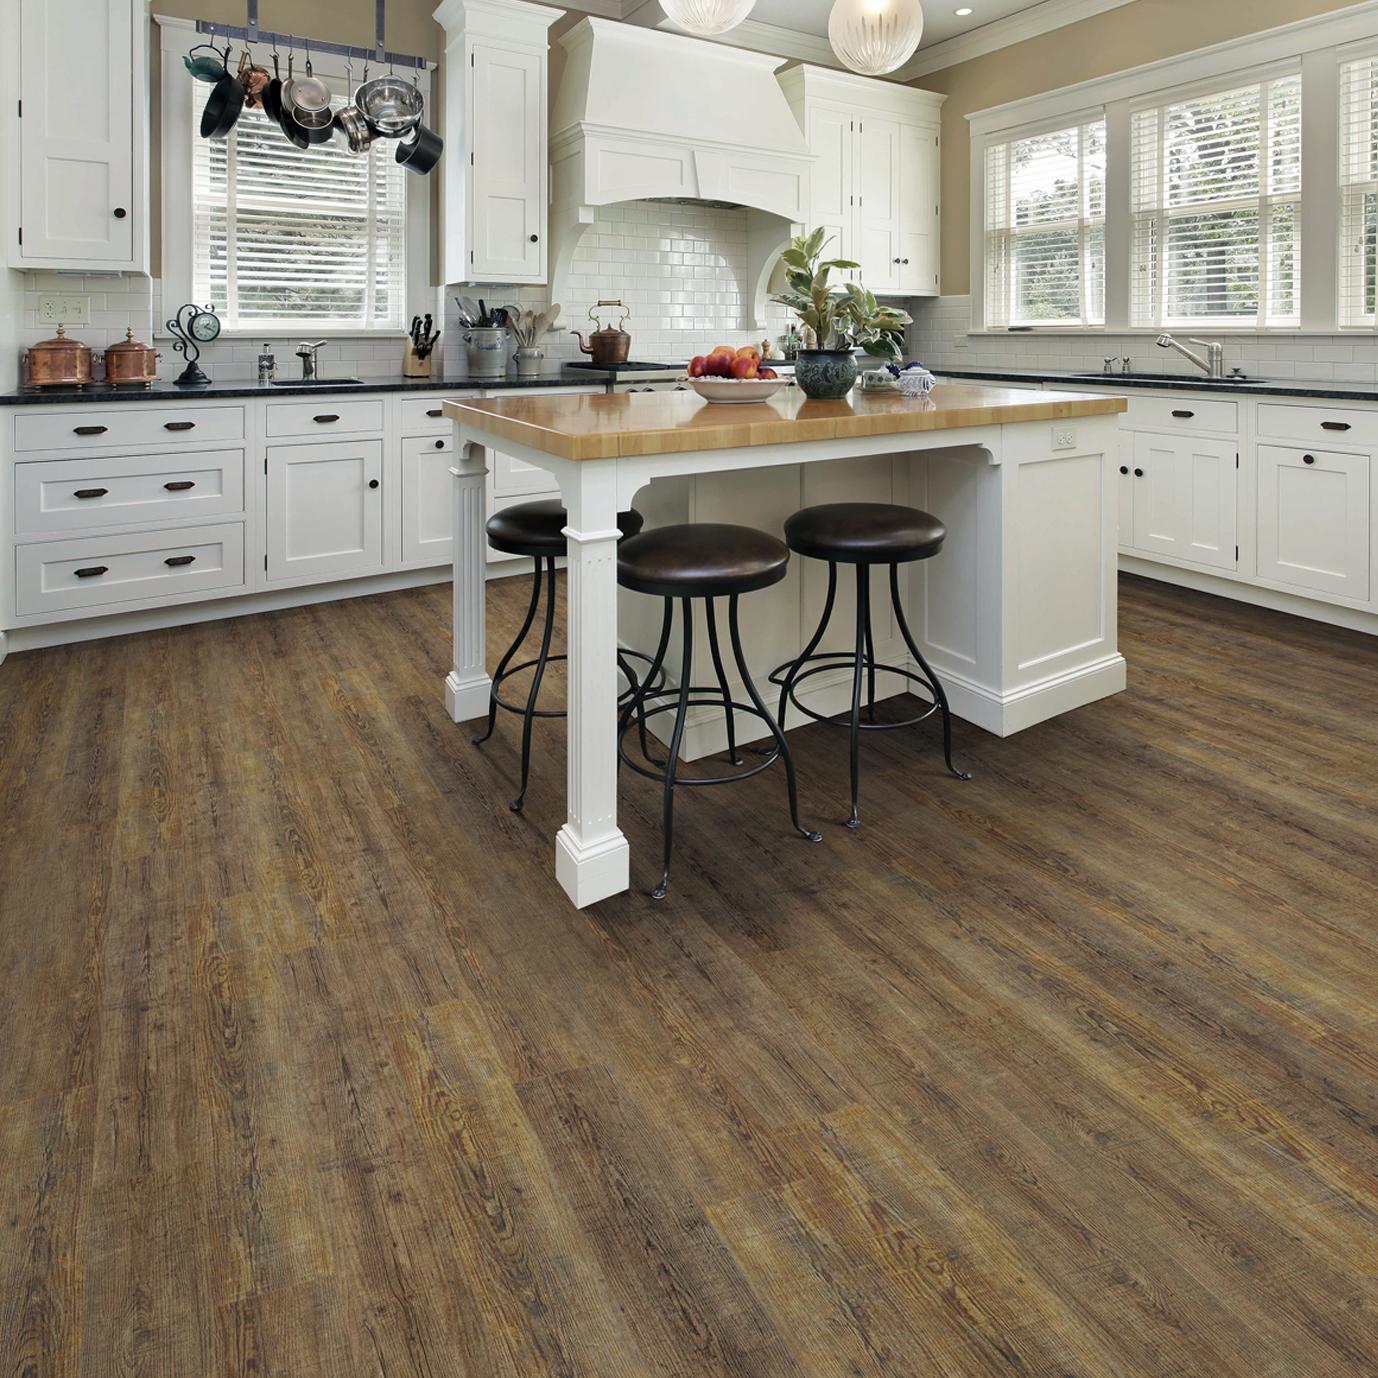 Next Floor - Expanse Plank - 527 005.jpg